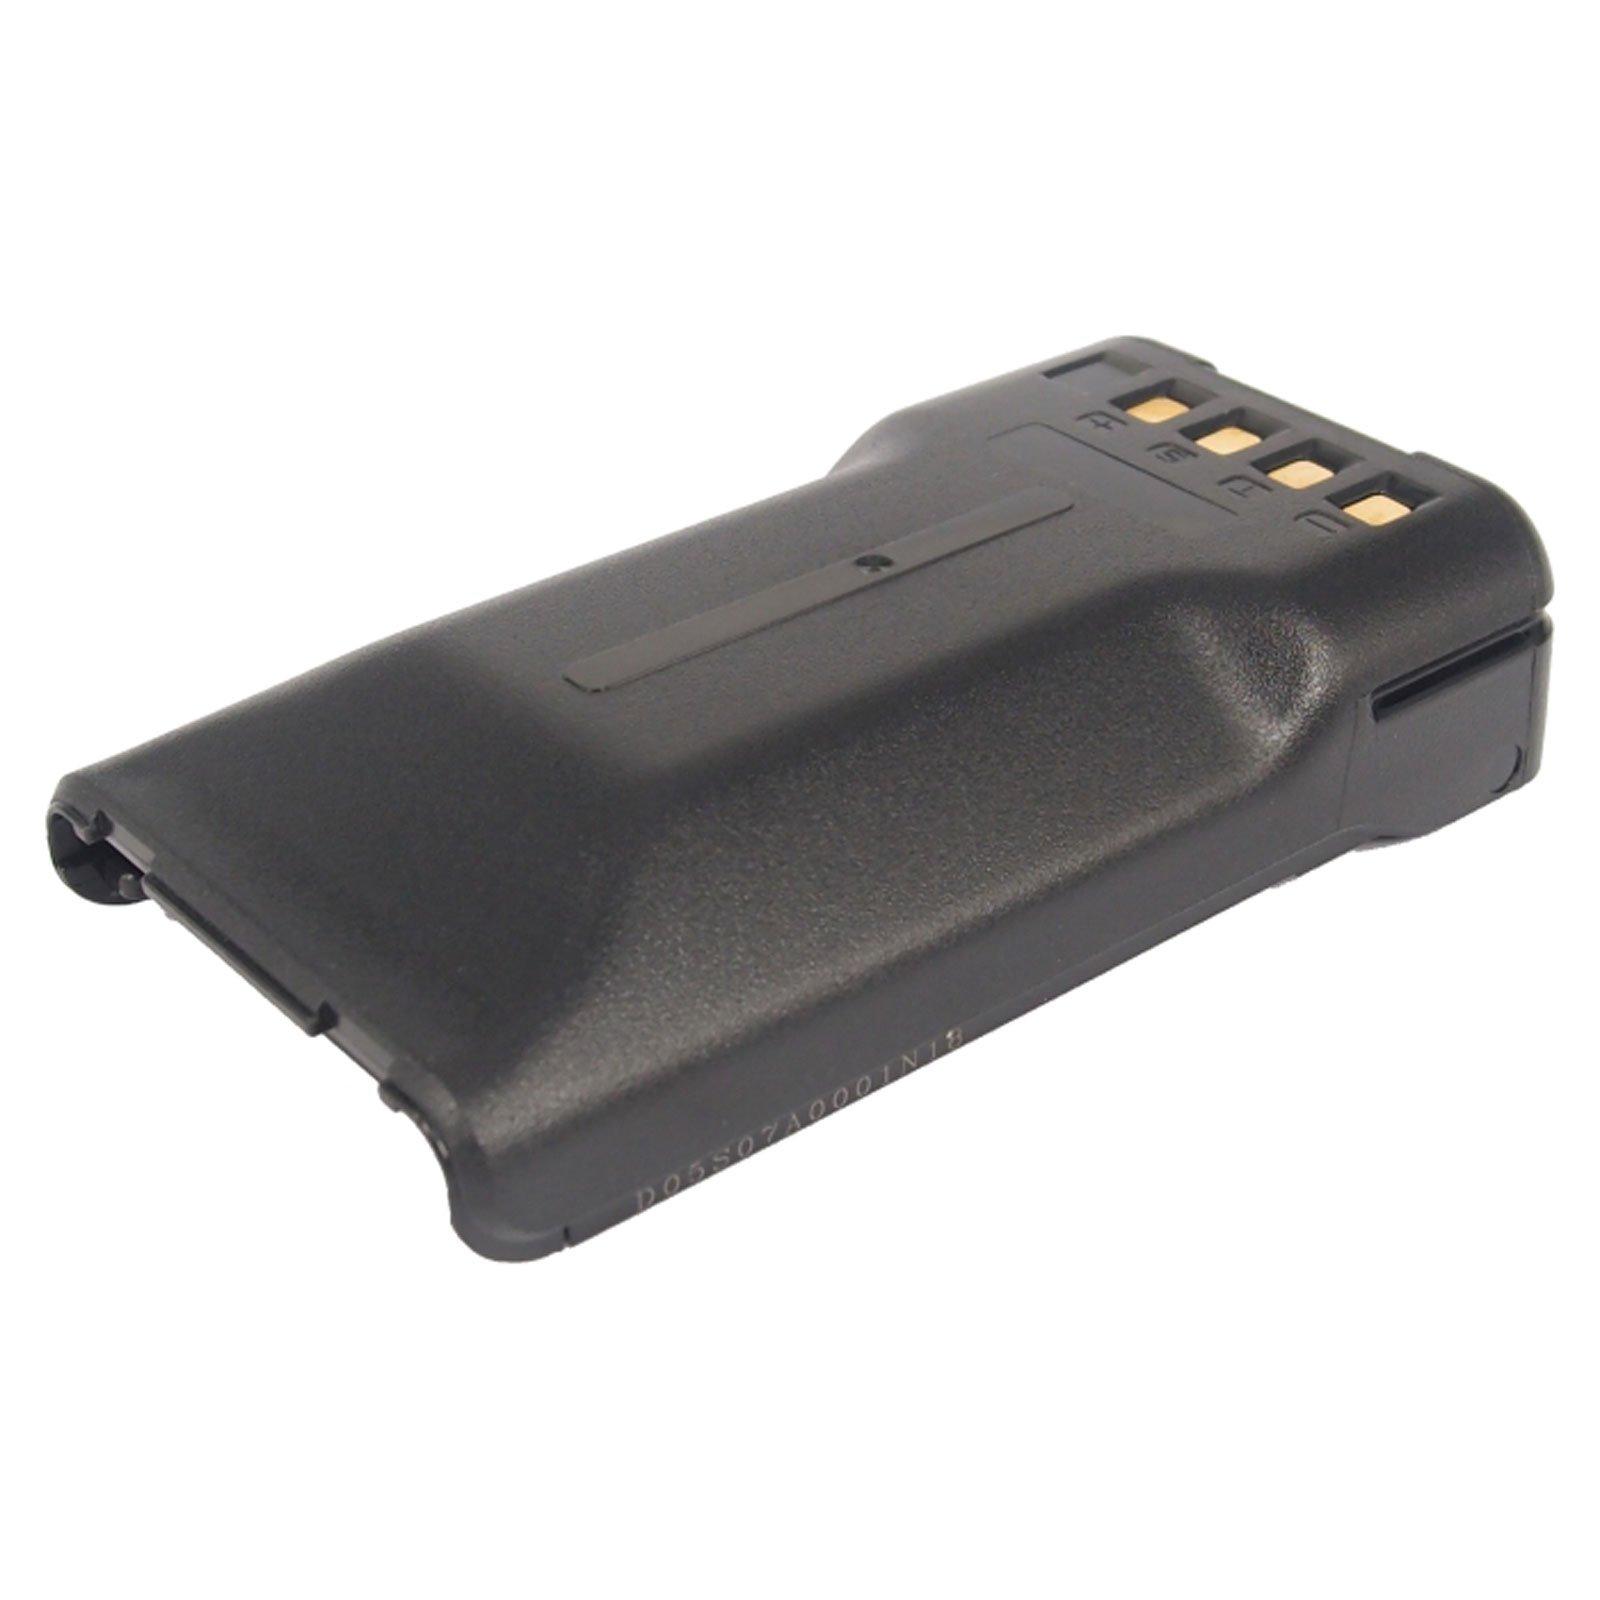 3X 7.4V 2500mAh Li-Ion FRS 2way Radio Battery Fits Kenwood KNB-48L, KNB47L, NX-200, NX-300, TK-5220, TK-5320, For Handheld, Mobile, Communication, Wireless, Portable, Two Way Walkie Talkie, Ham by Exell Battery (Image #4)